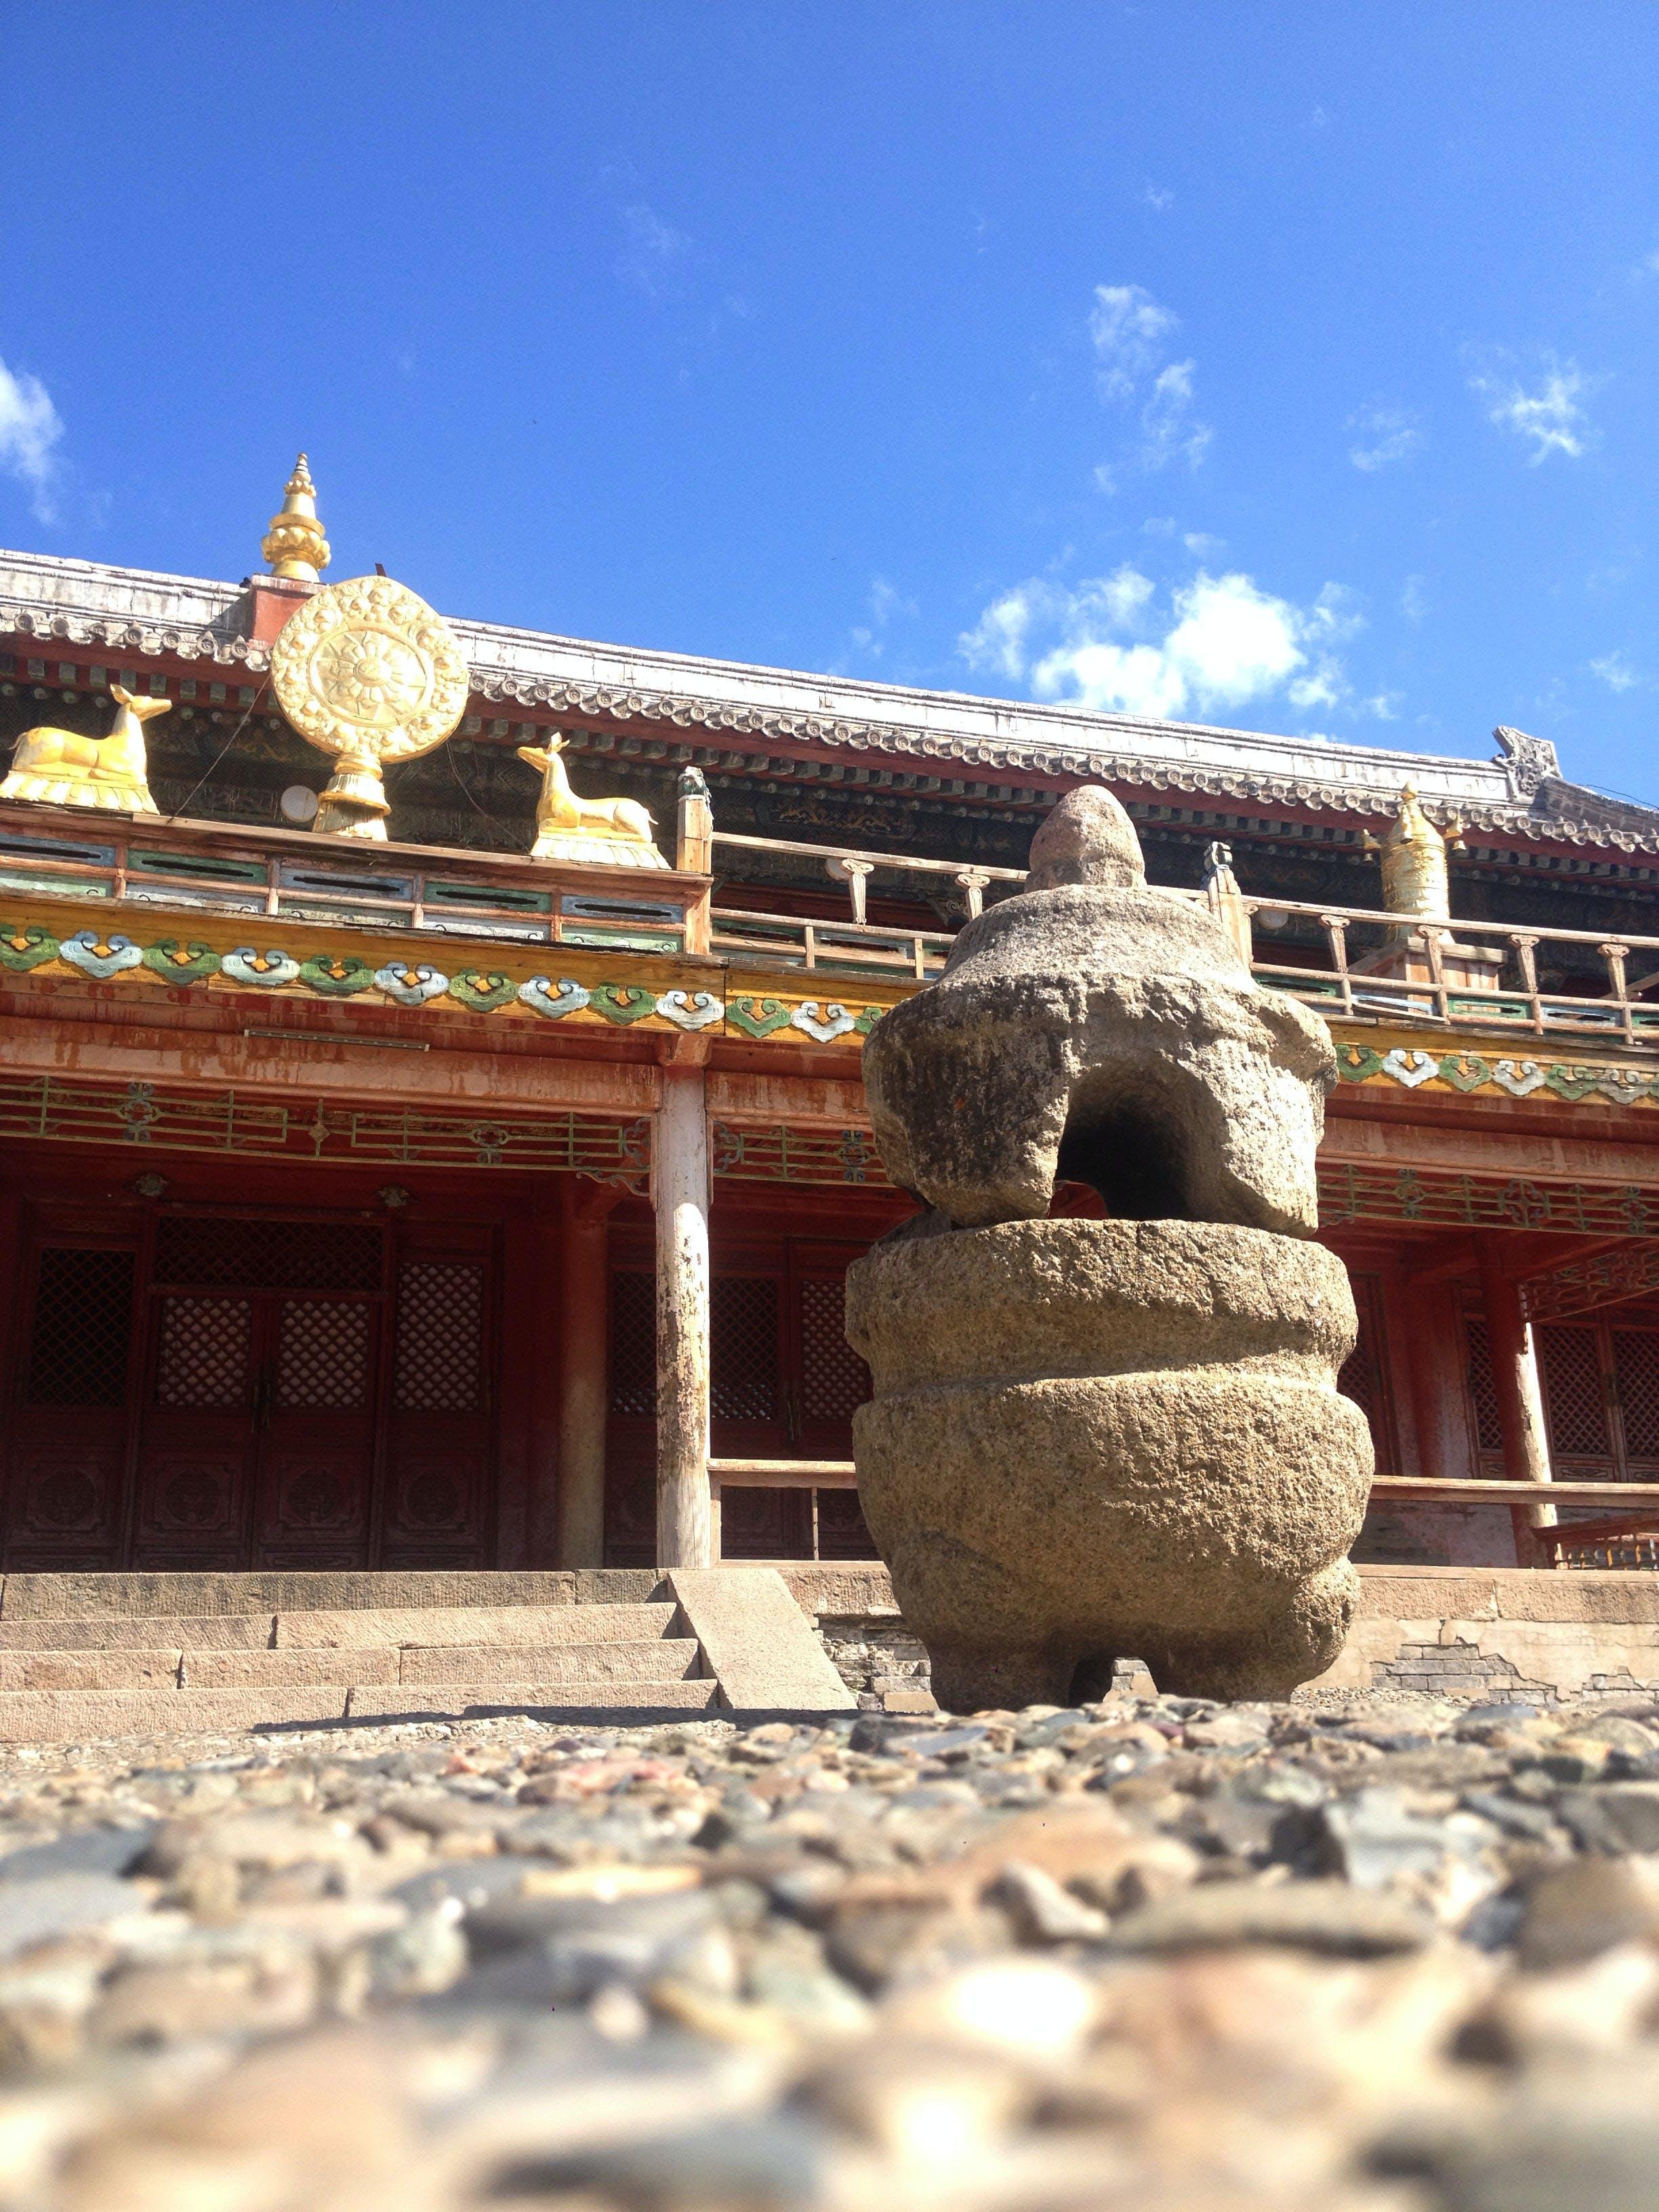 Gratis lagerfoto af amarbayasgalant, buddha, historie, kloster